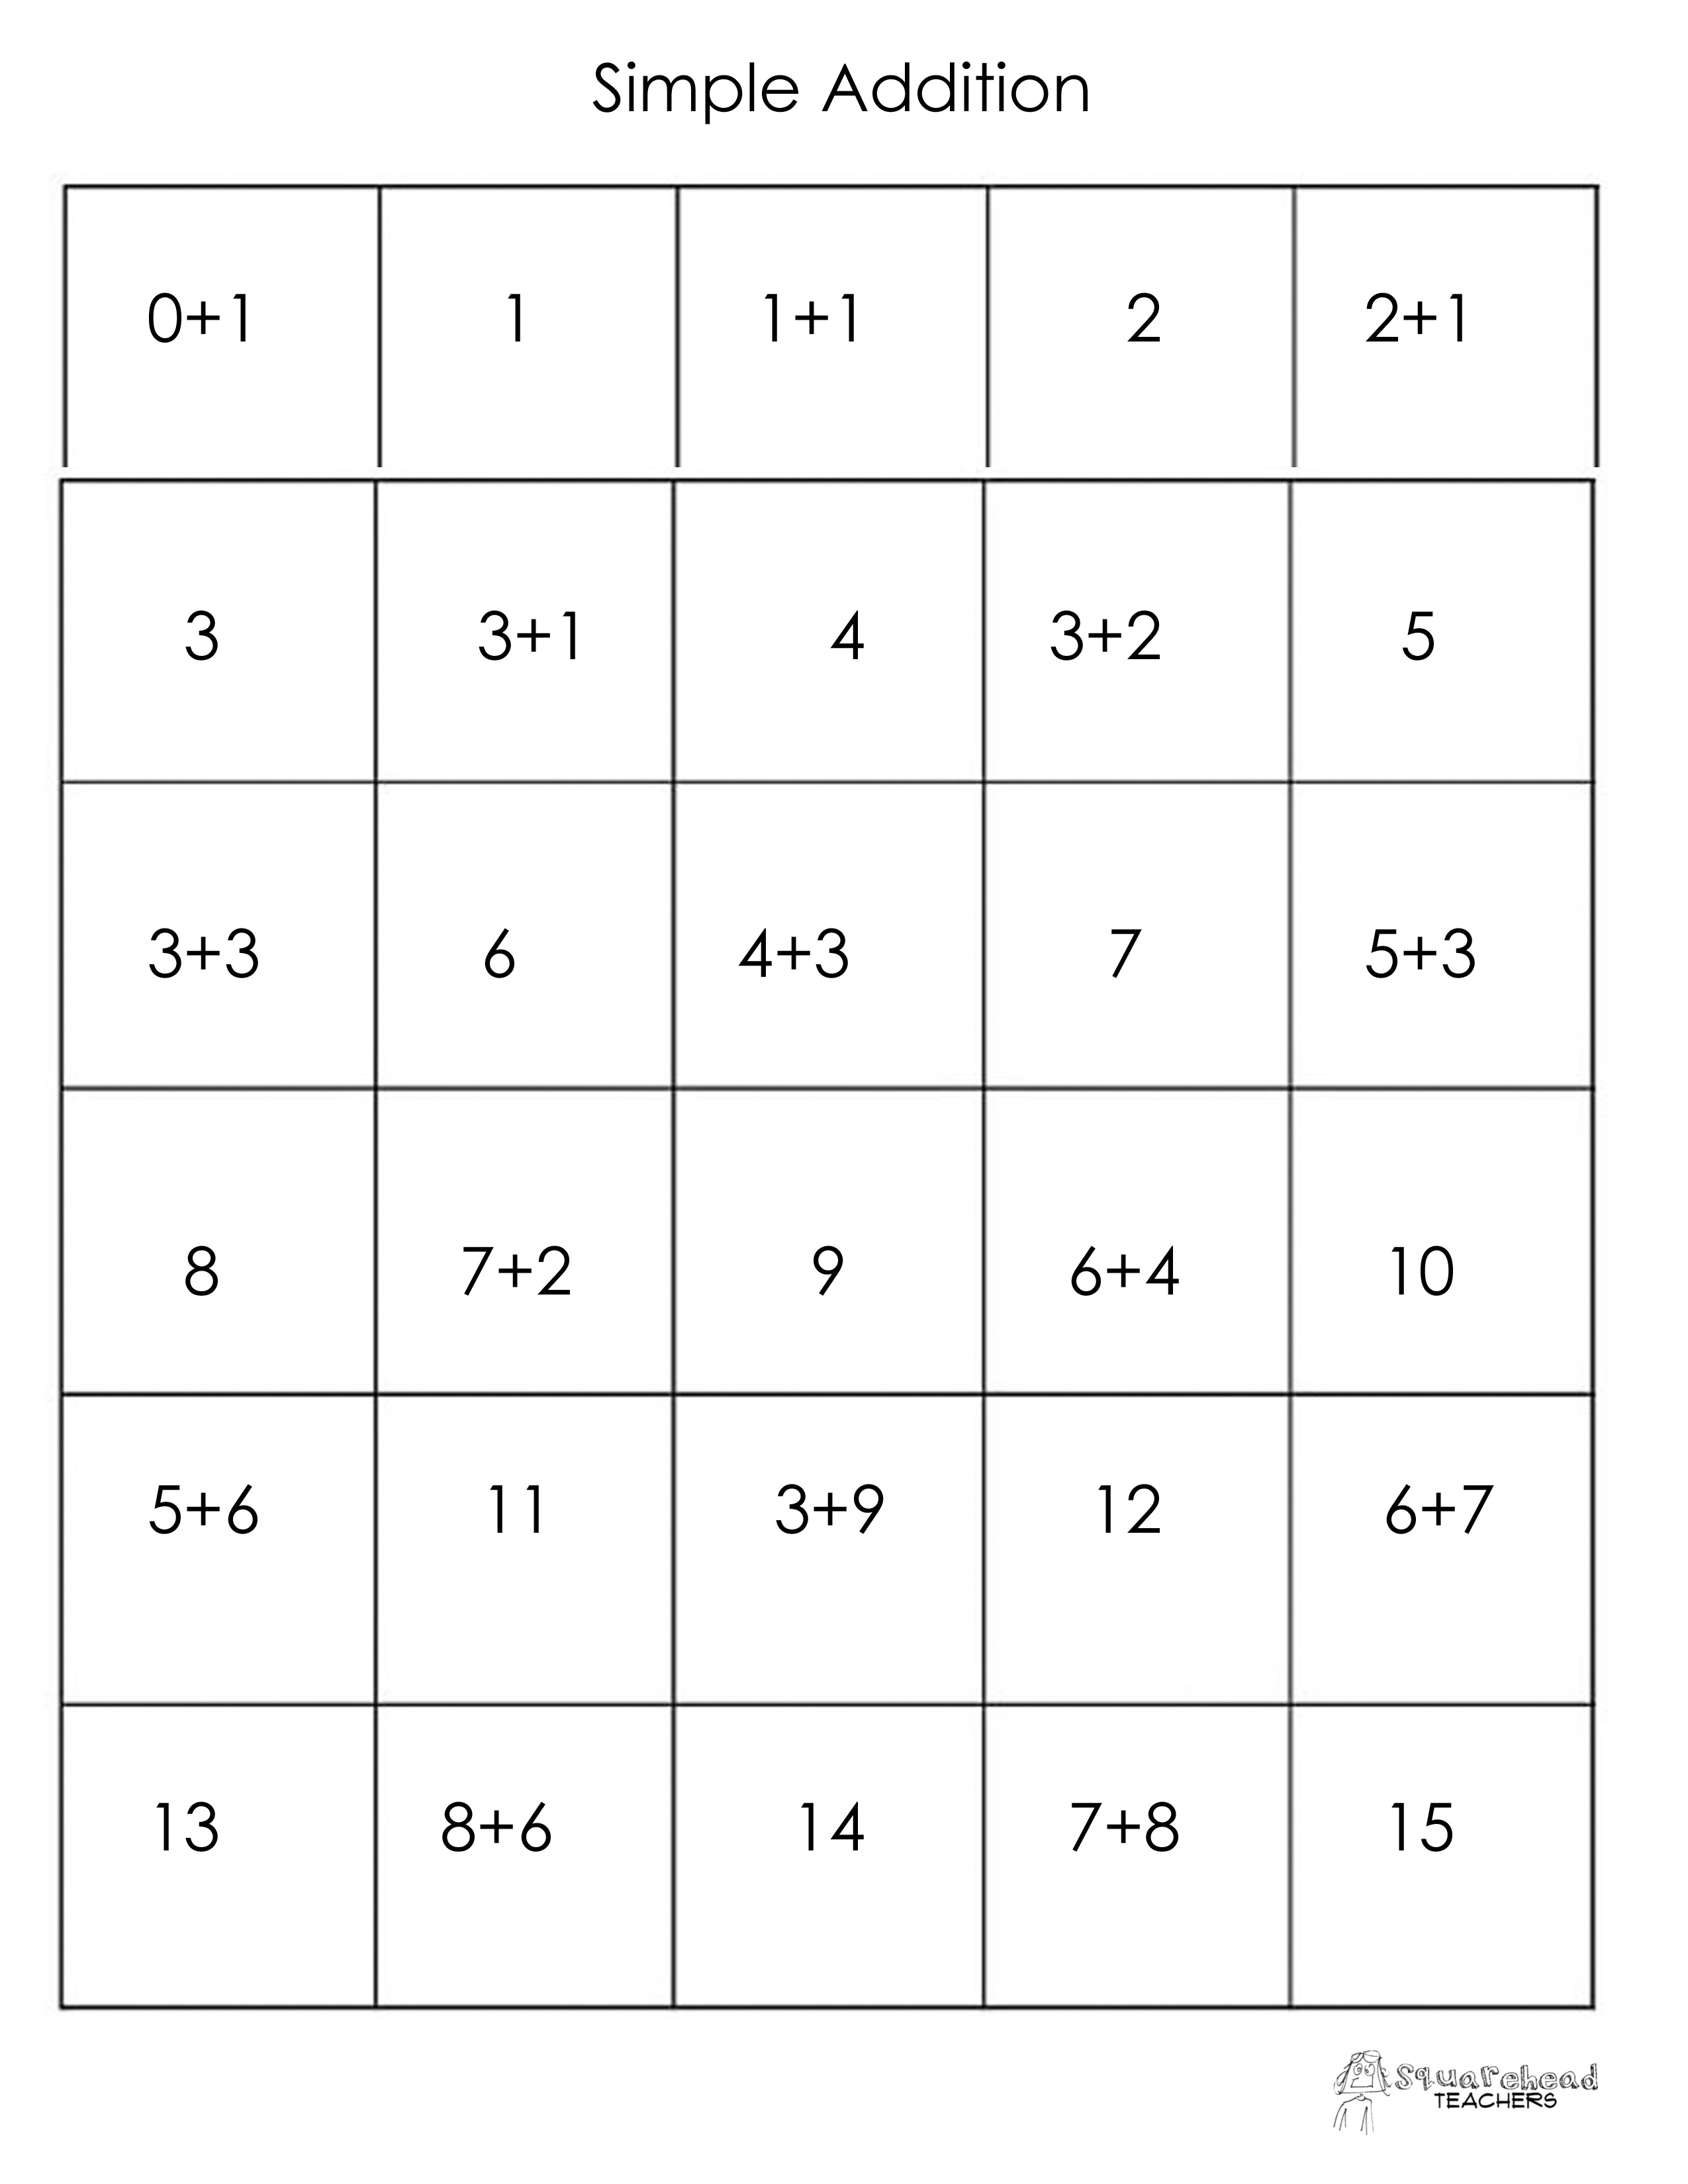 Free simple addition worksheets kindergarten 2898862 - aks-flight.info